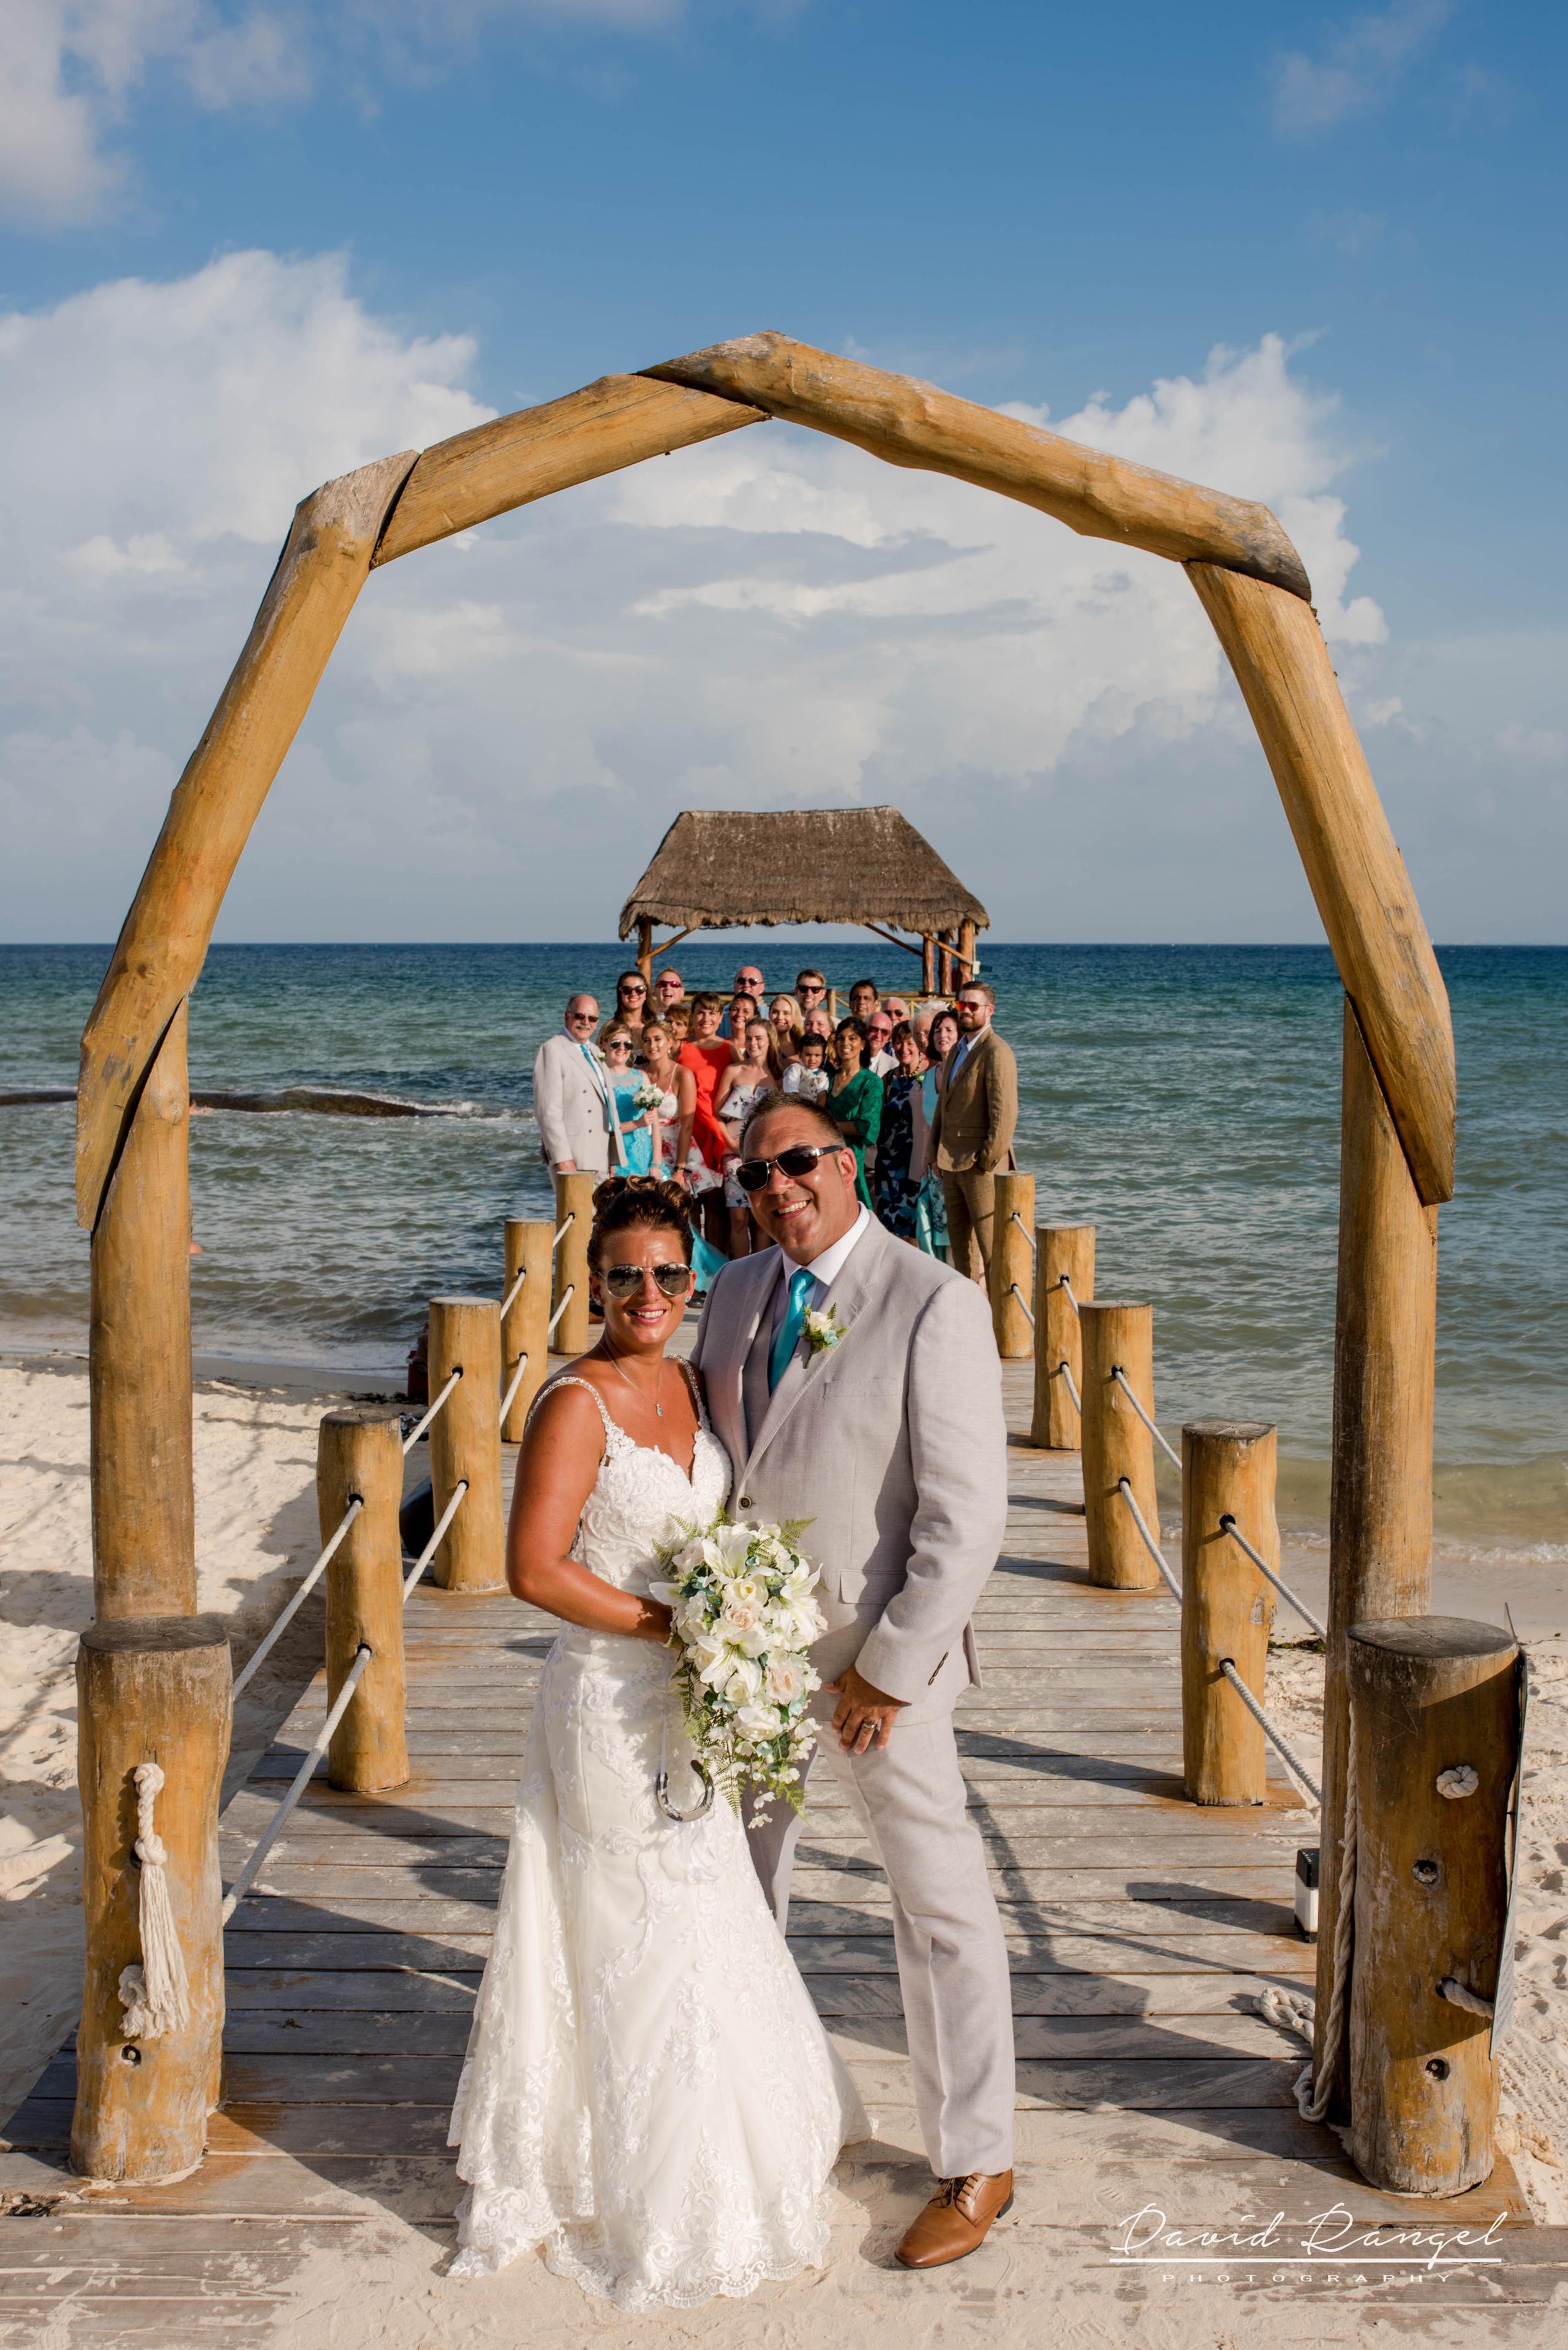 wedding+group+photo+pier